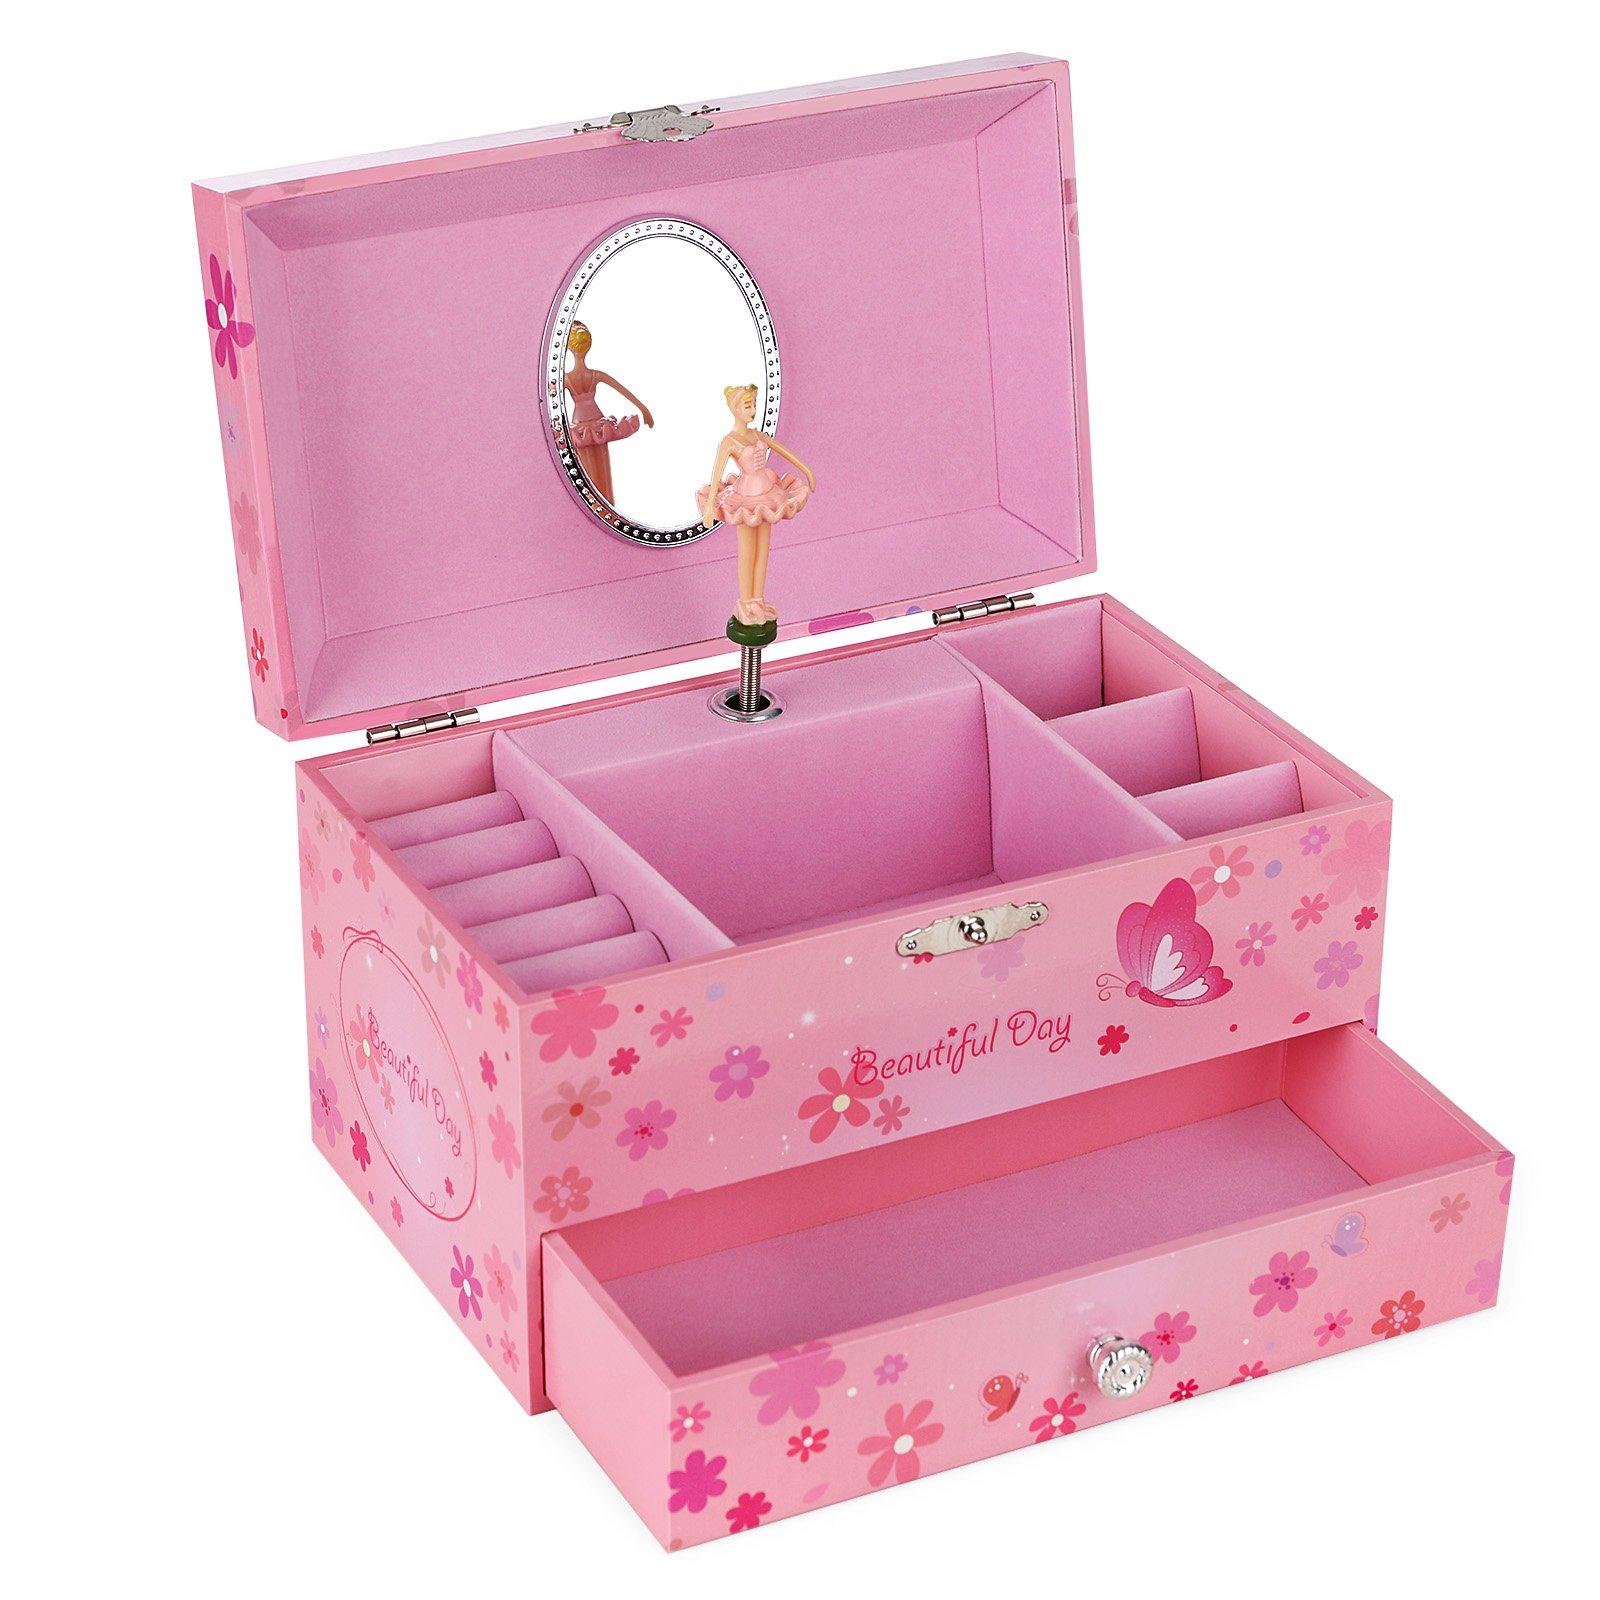 SONGMICS Ballerina Musical Jewelry Box Girls Jewel Storage Case UJMC003